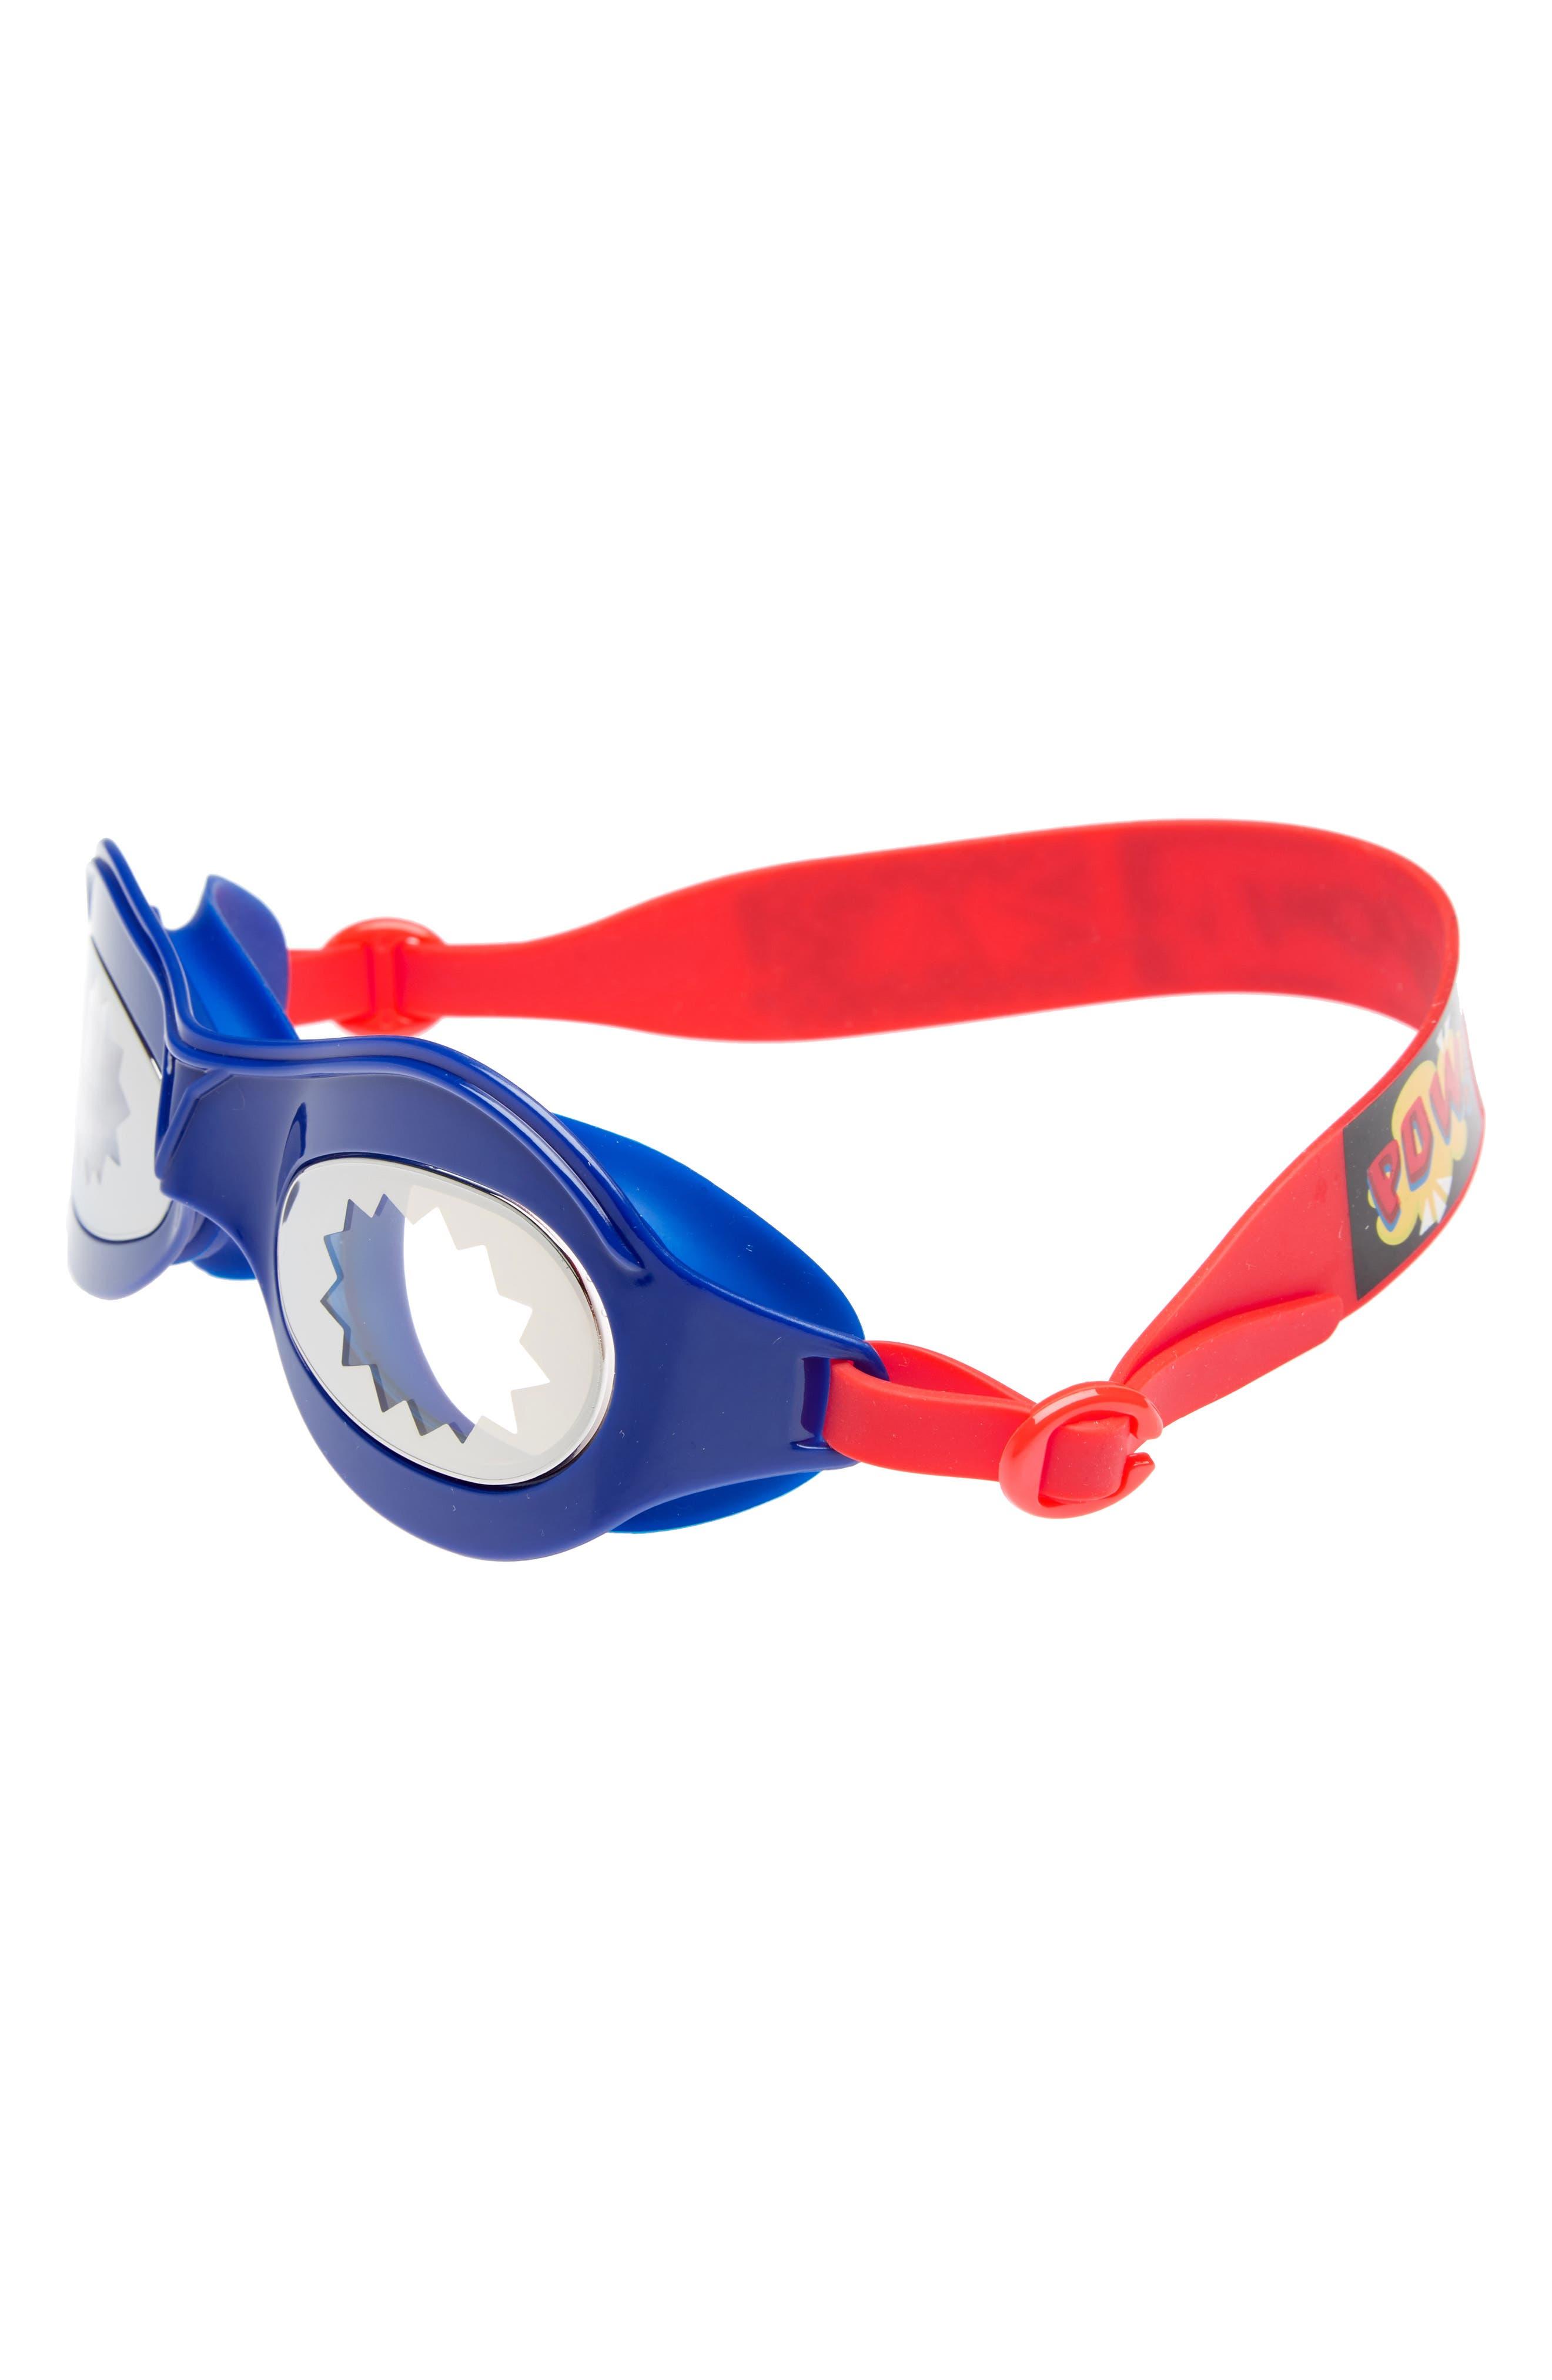 Atomic Comic Swim Goggles,                             Main thumbnail 1, color,                             400